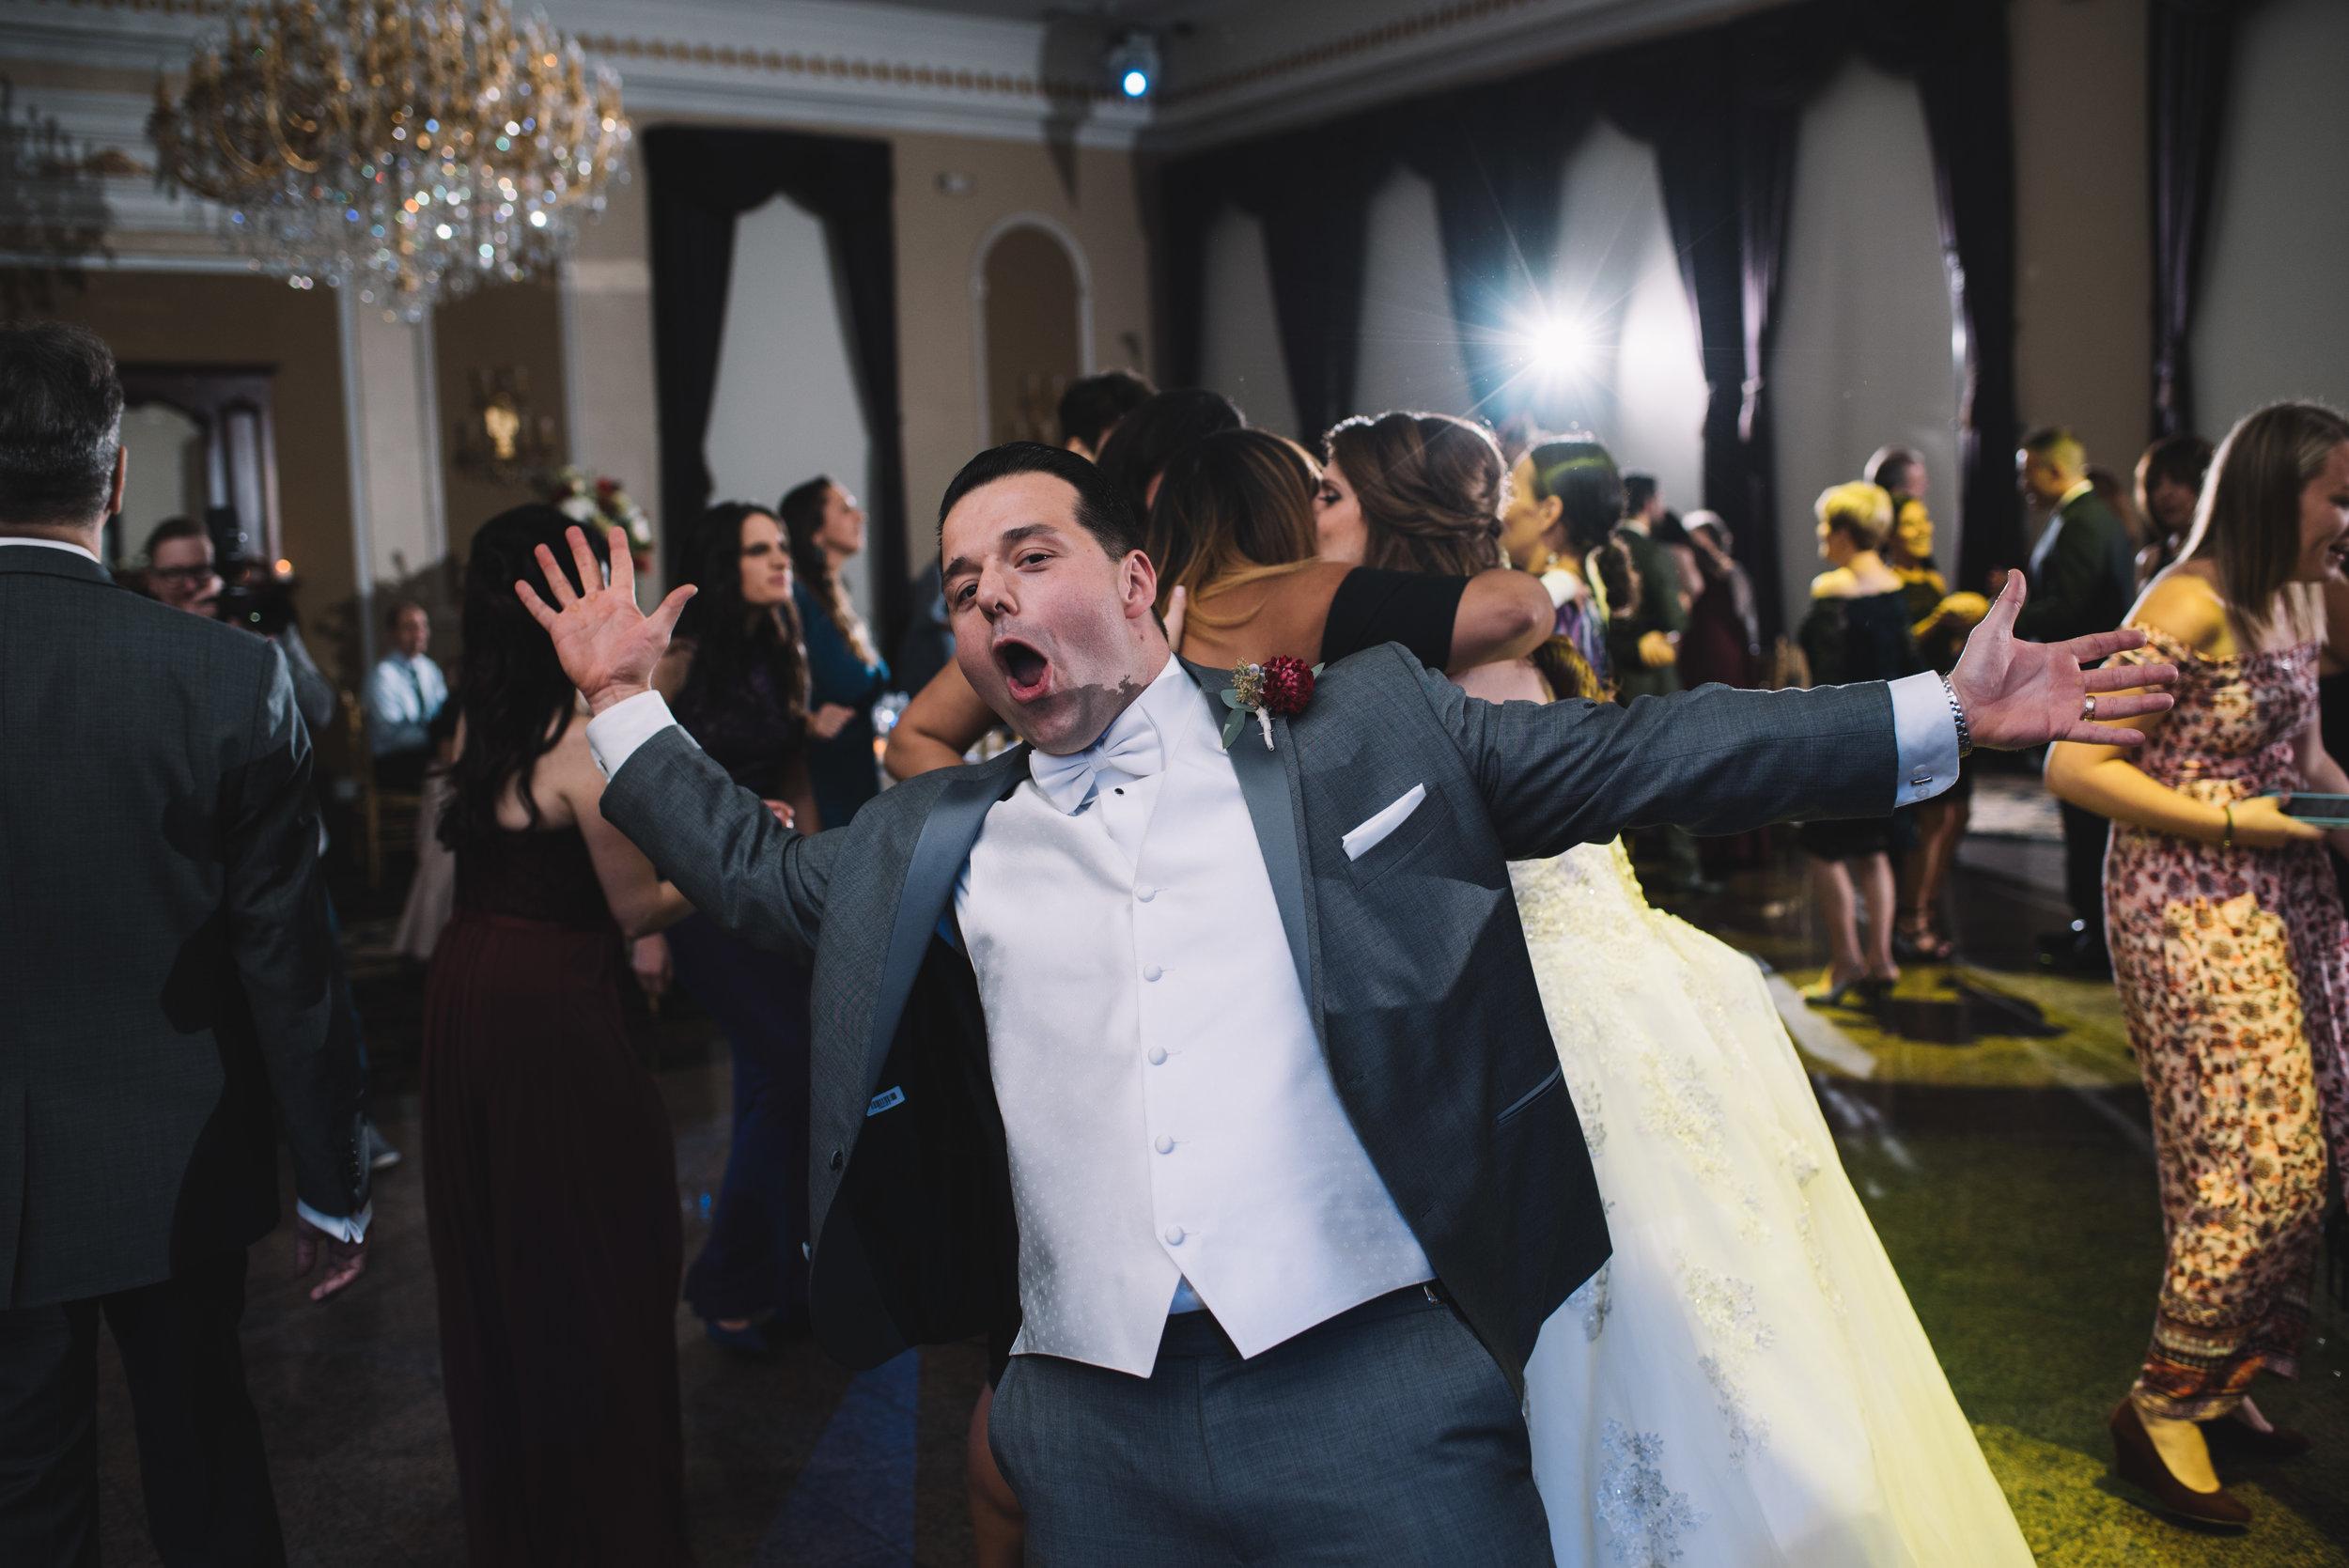 WeddingPhotos | NJPhotographer | Highlights-12-14.jpg